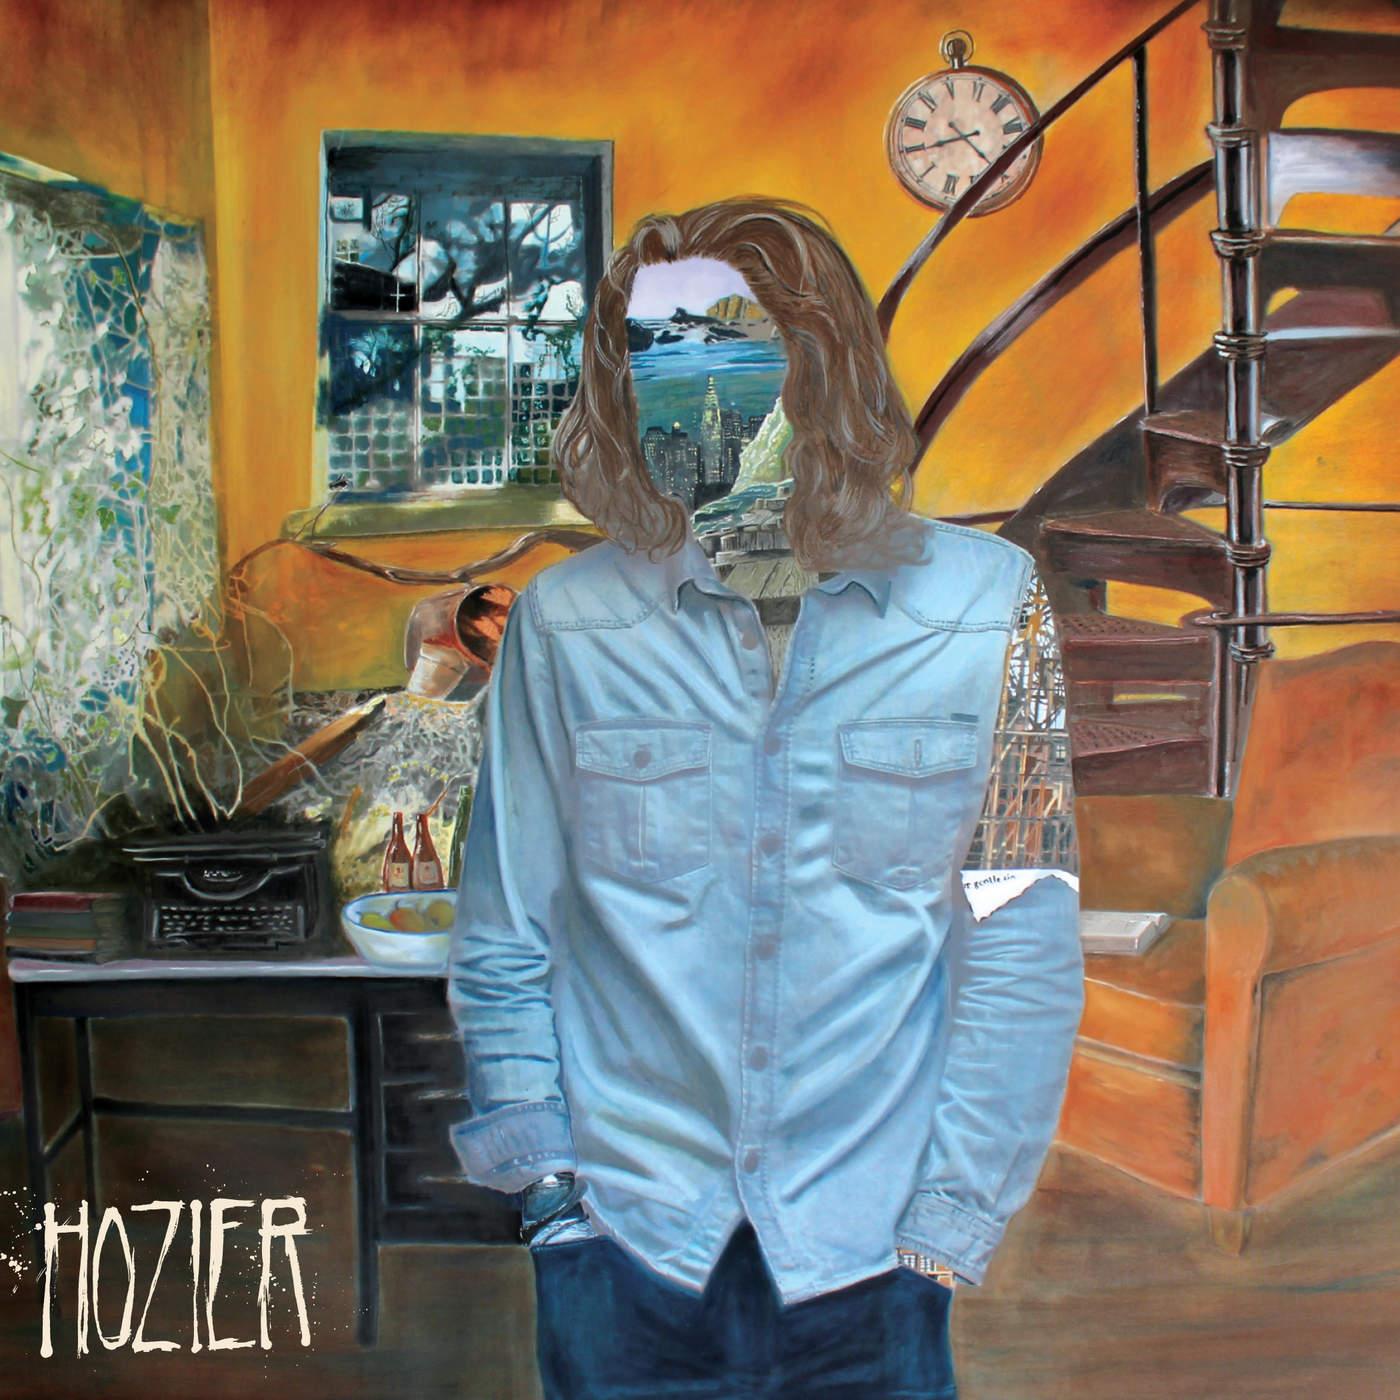 Hozier (iTunes Festival Deluxe Edition) (CD2) - Hozier